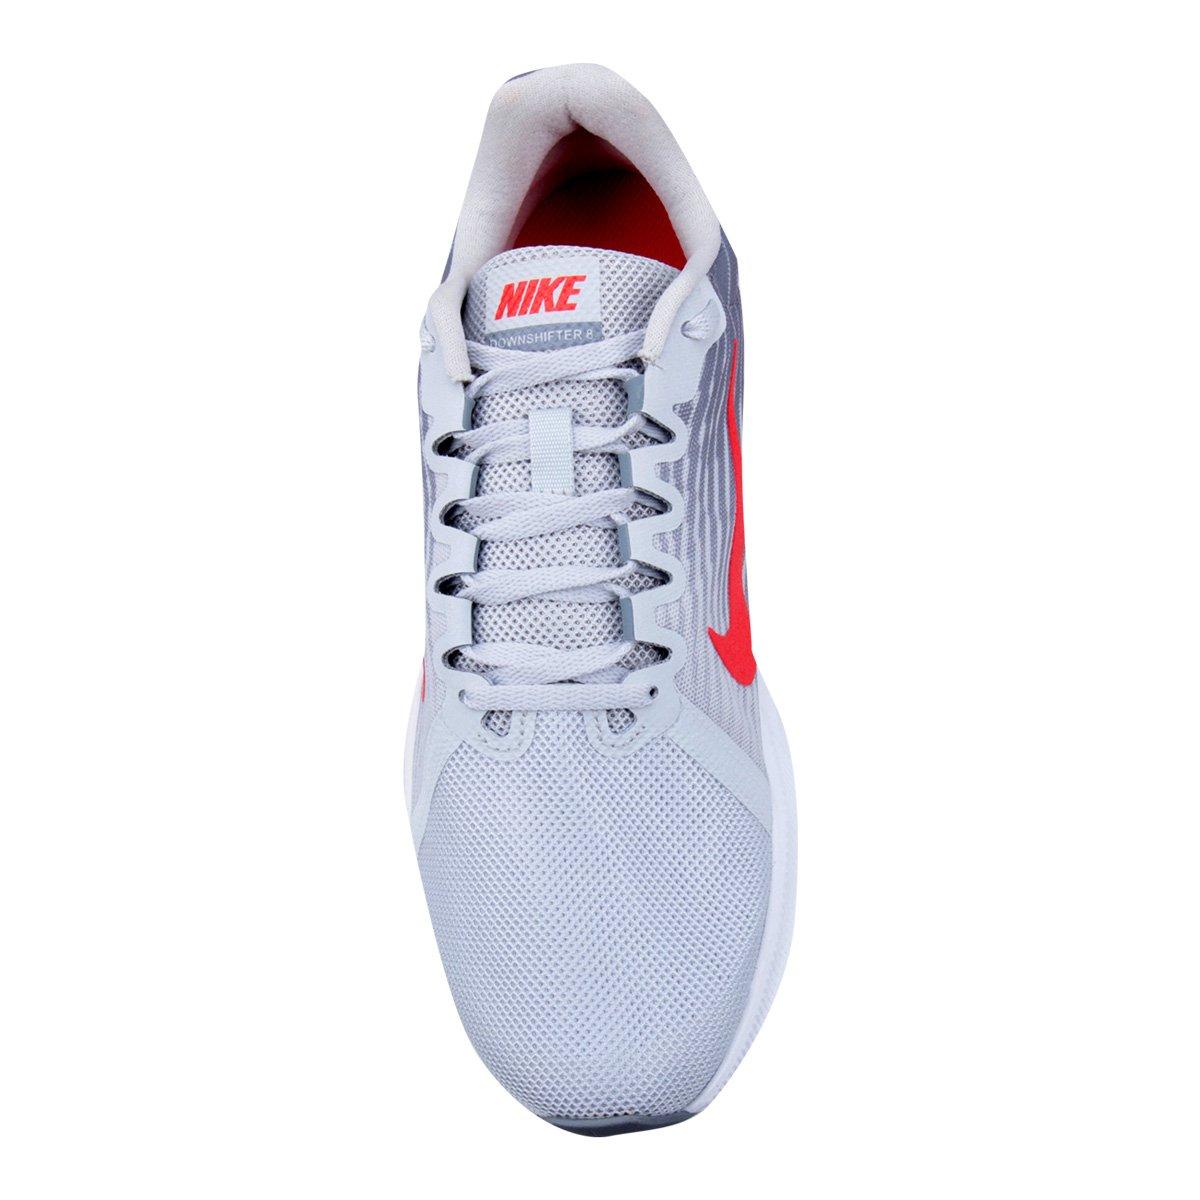 Tênis Nike Wmns Downshifter 8 Masculino Cinza E Vermelho